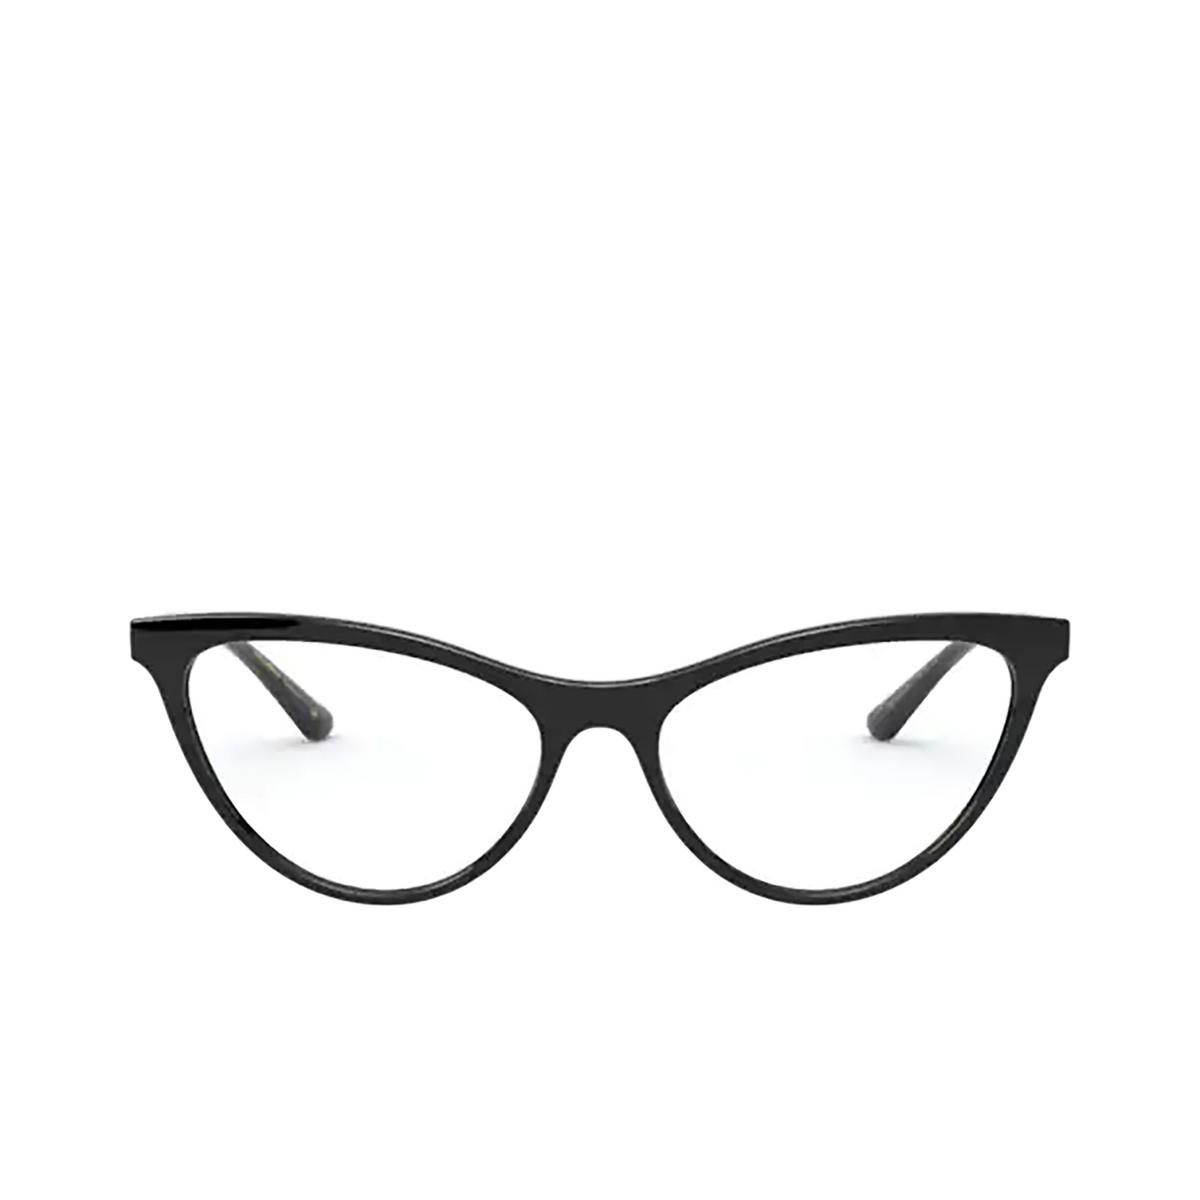 Dolce & Gabbana® Cat-eye Eyeglasses: DG5058 color Black 501 - front view.